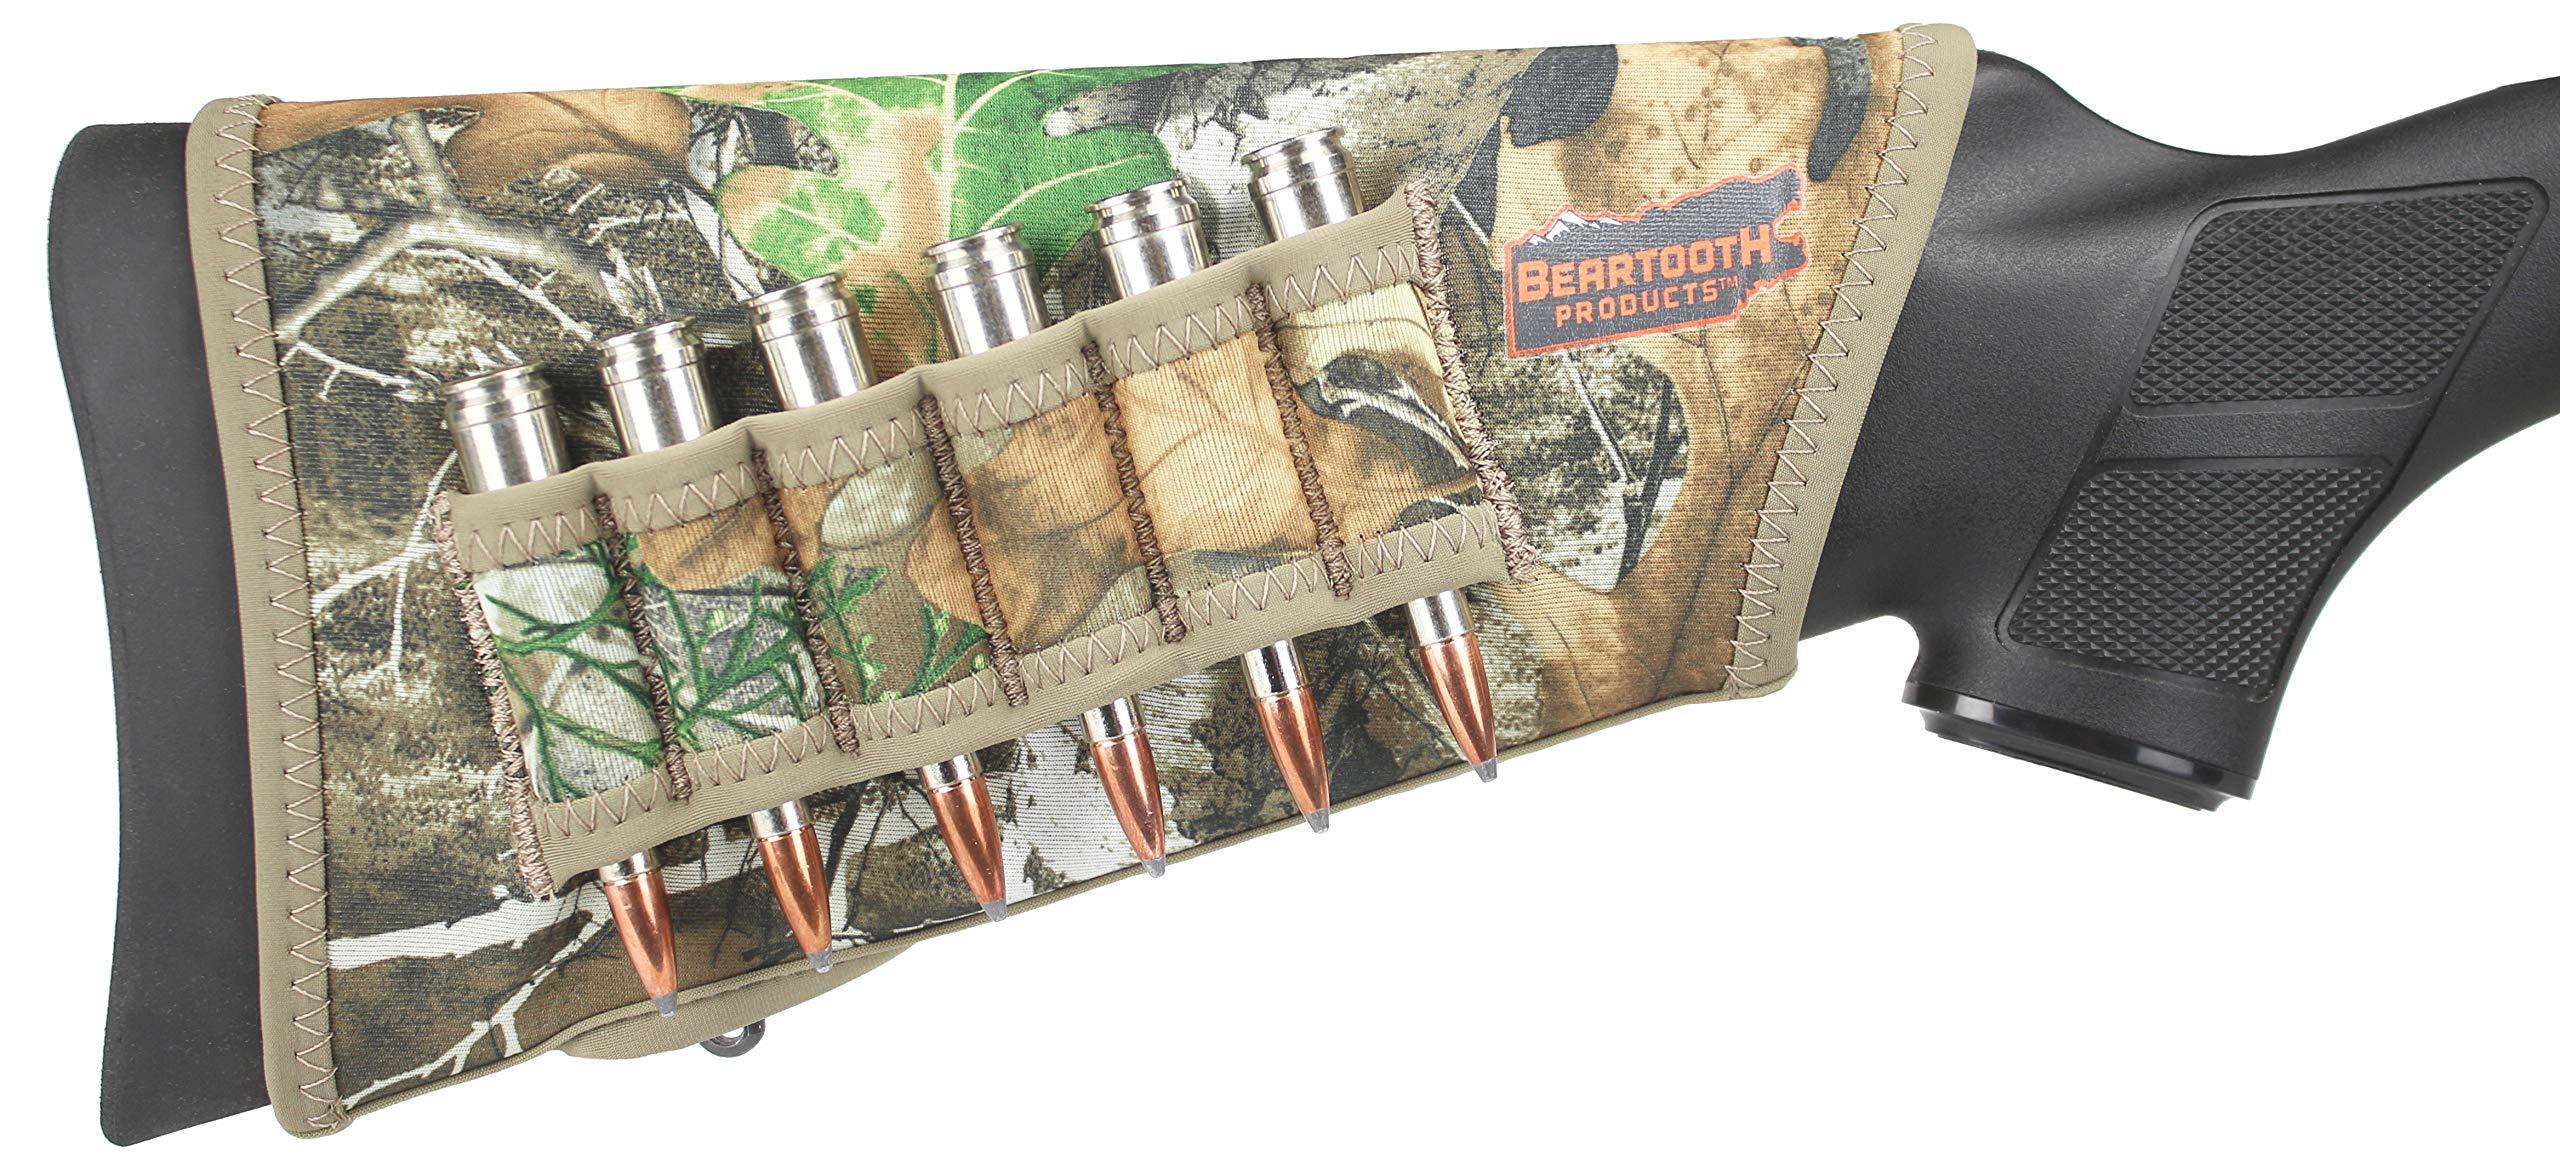 Beartooth StockGuard 2.0 - Premium Neoprene Gun Stock Cover - Rifle Model (Realtree Edge) by Beartooth Products